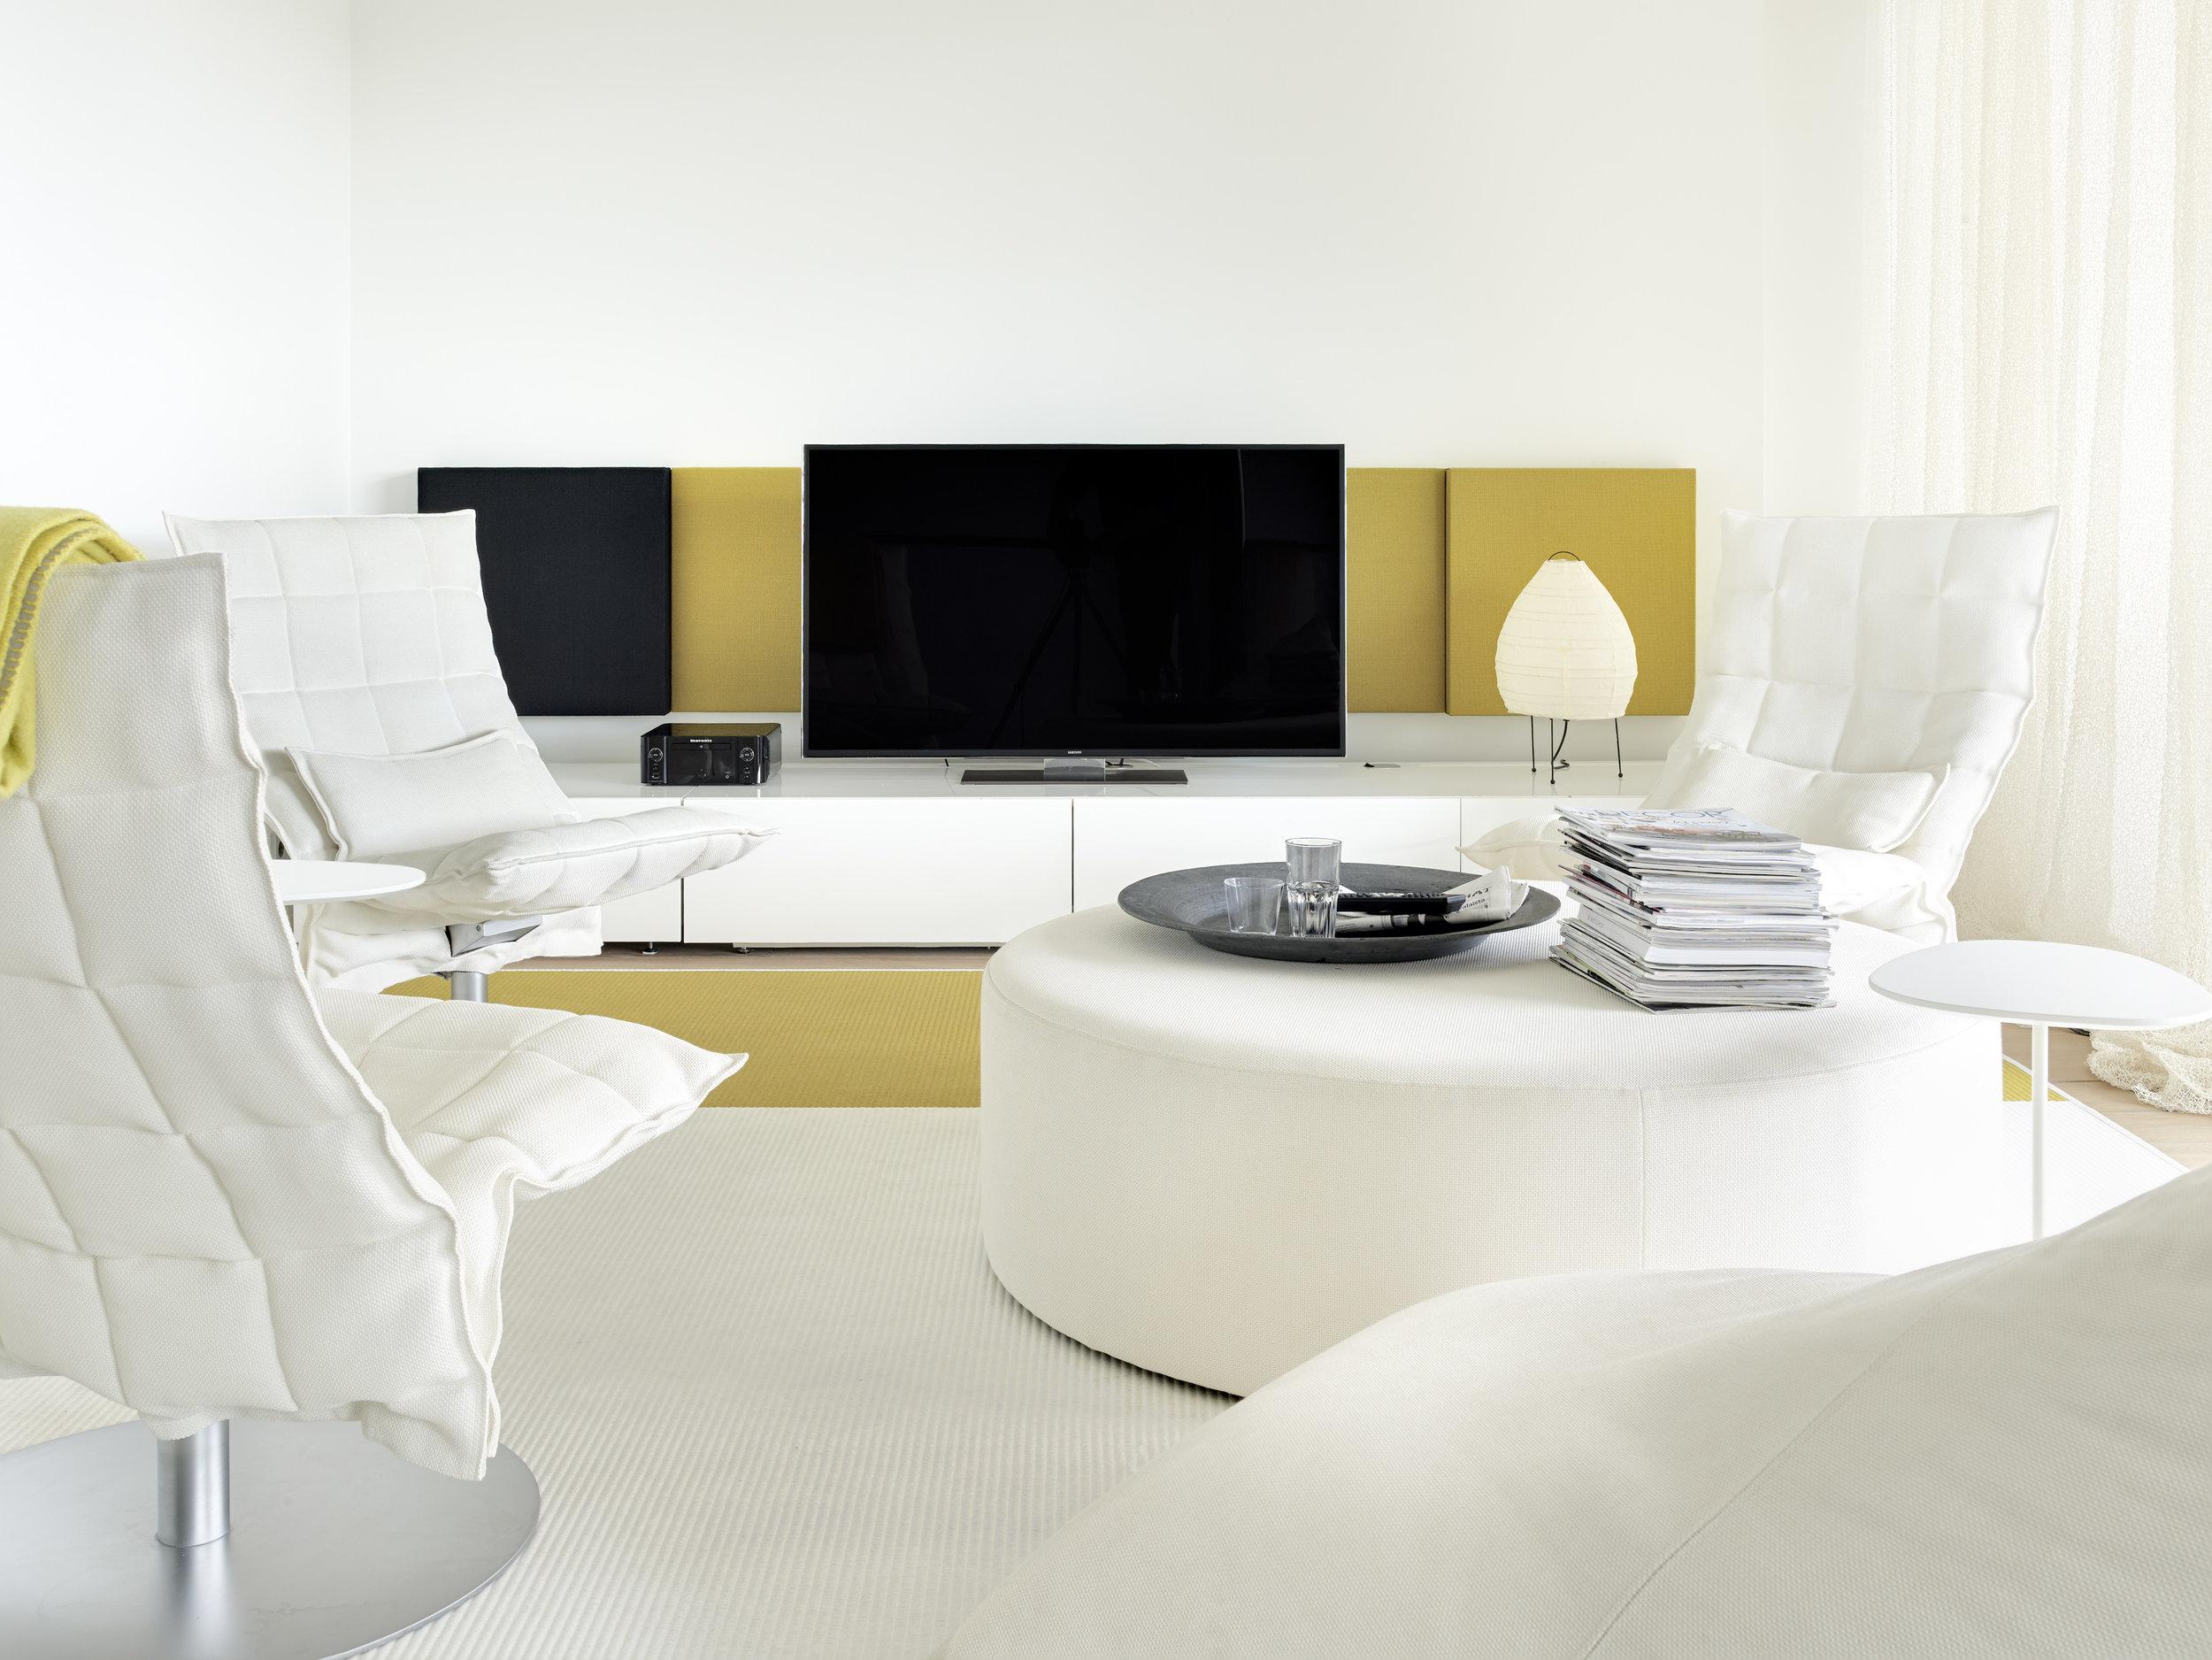 4850 Loudwhisper, 46007 Narrow Swivel k Chairs white, 1380134 Beach white-brass paper yarn carpet, 45601 Square bench white